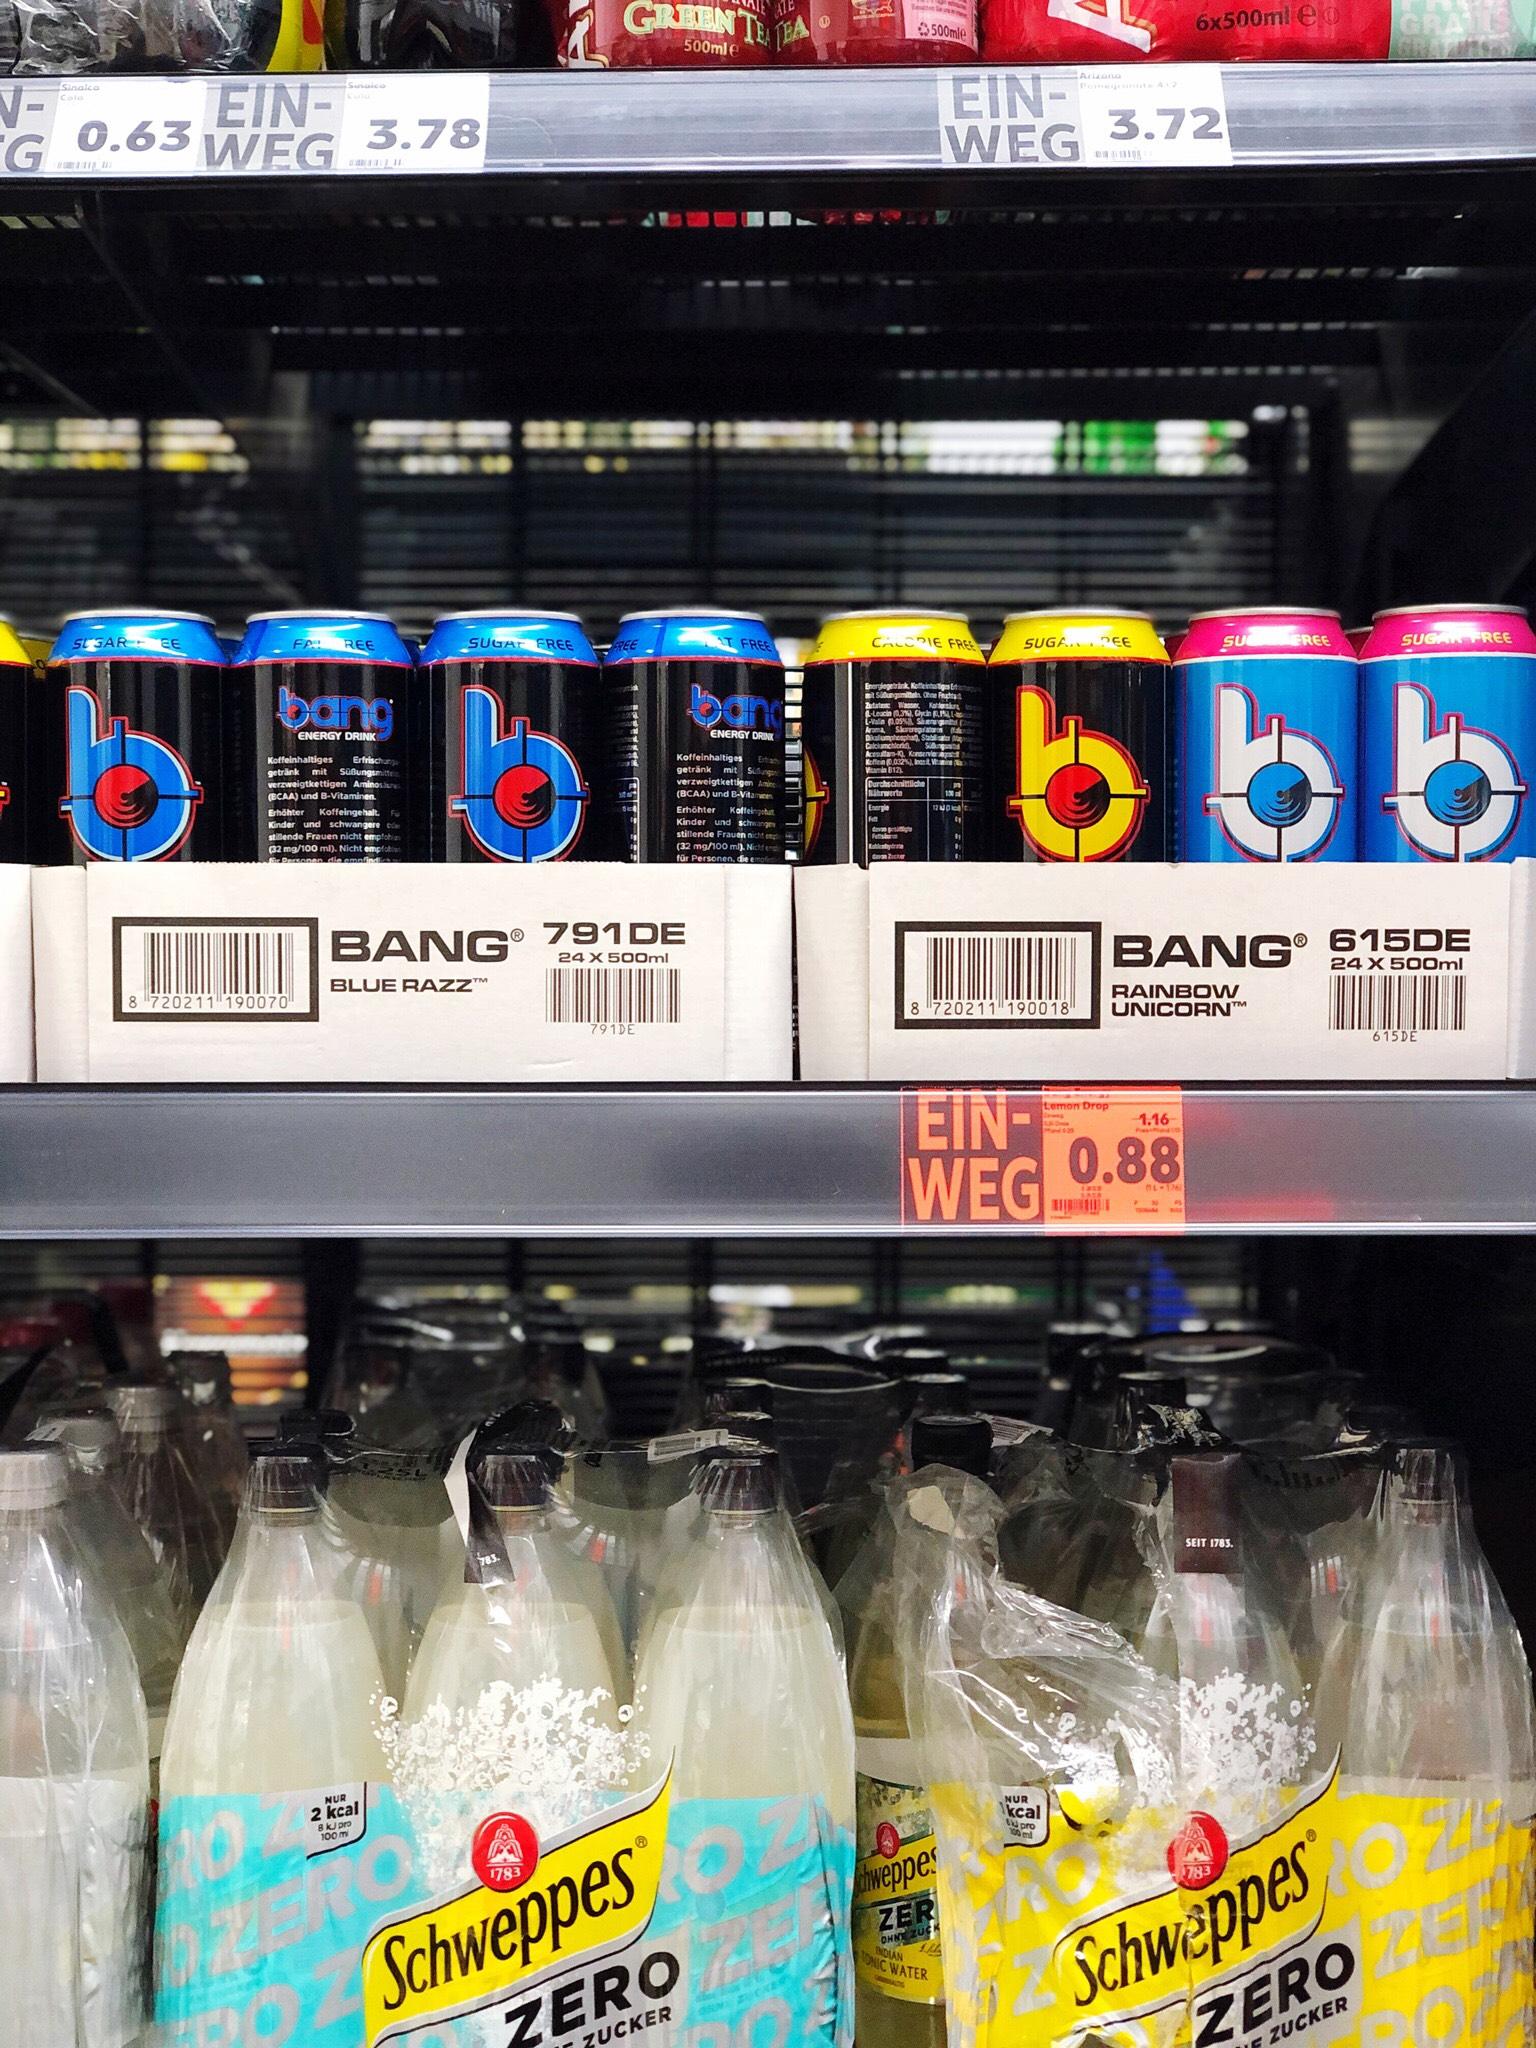 [LOKAL] Kaufland - Heidelberg/Weststadt - Bang Energy Drink (0,5l, vers. Sorten)